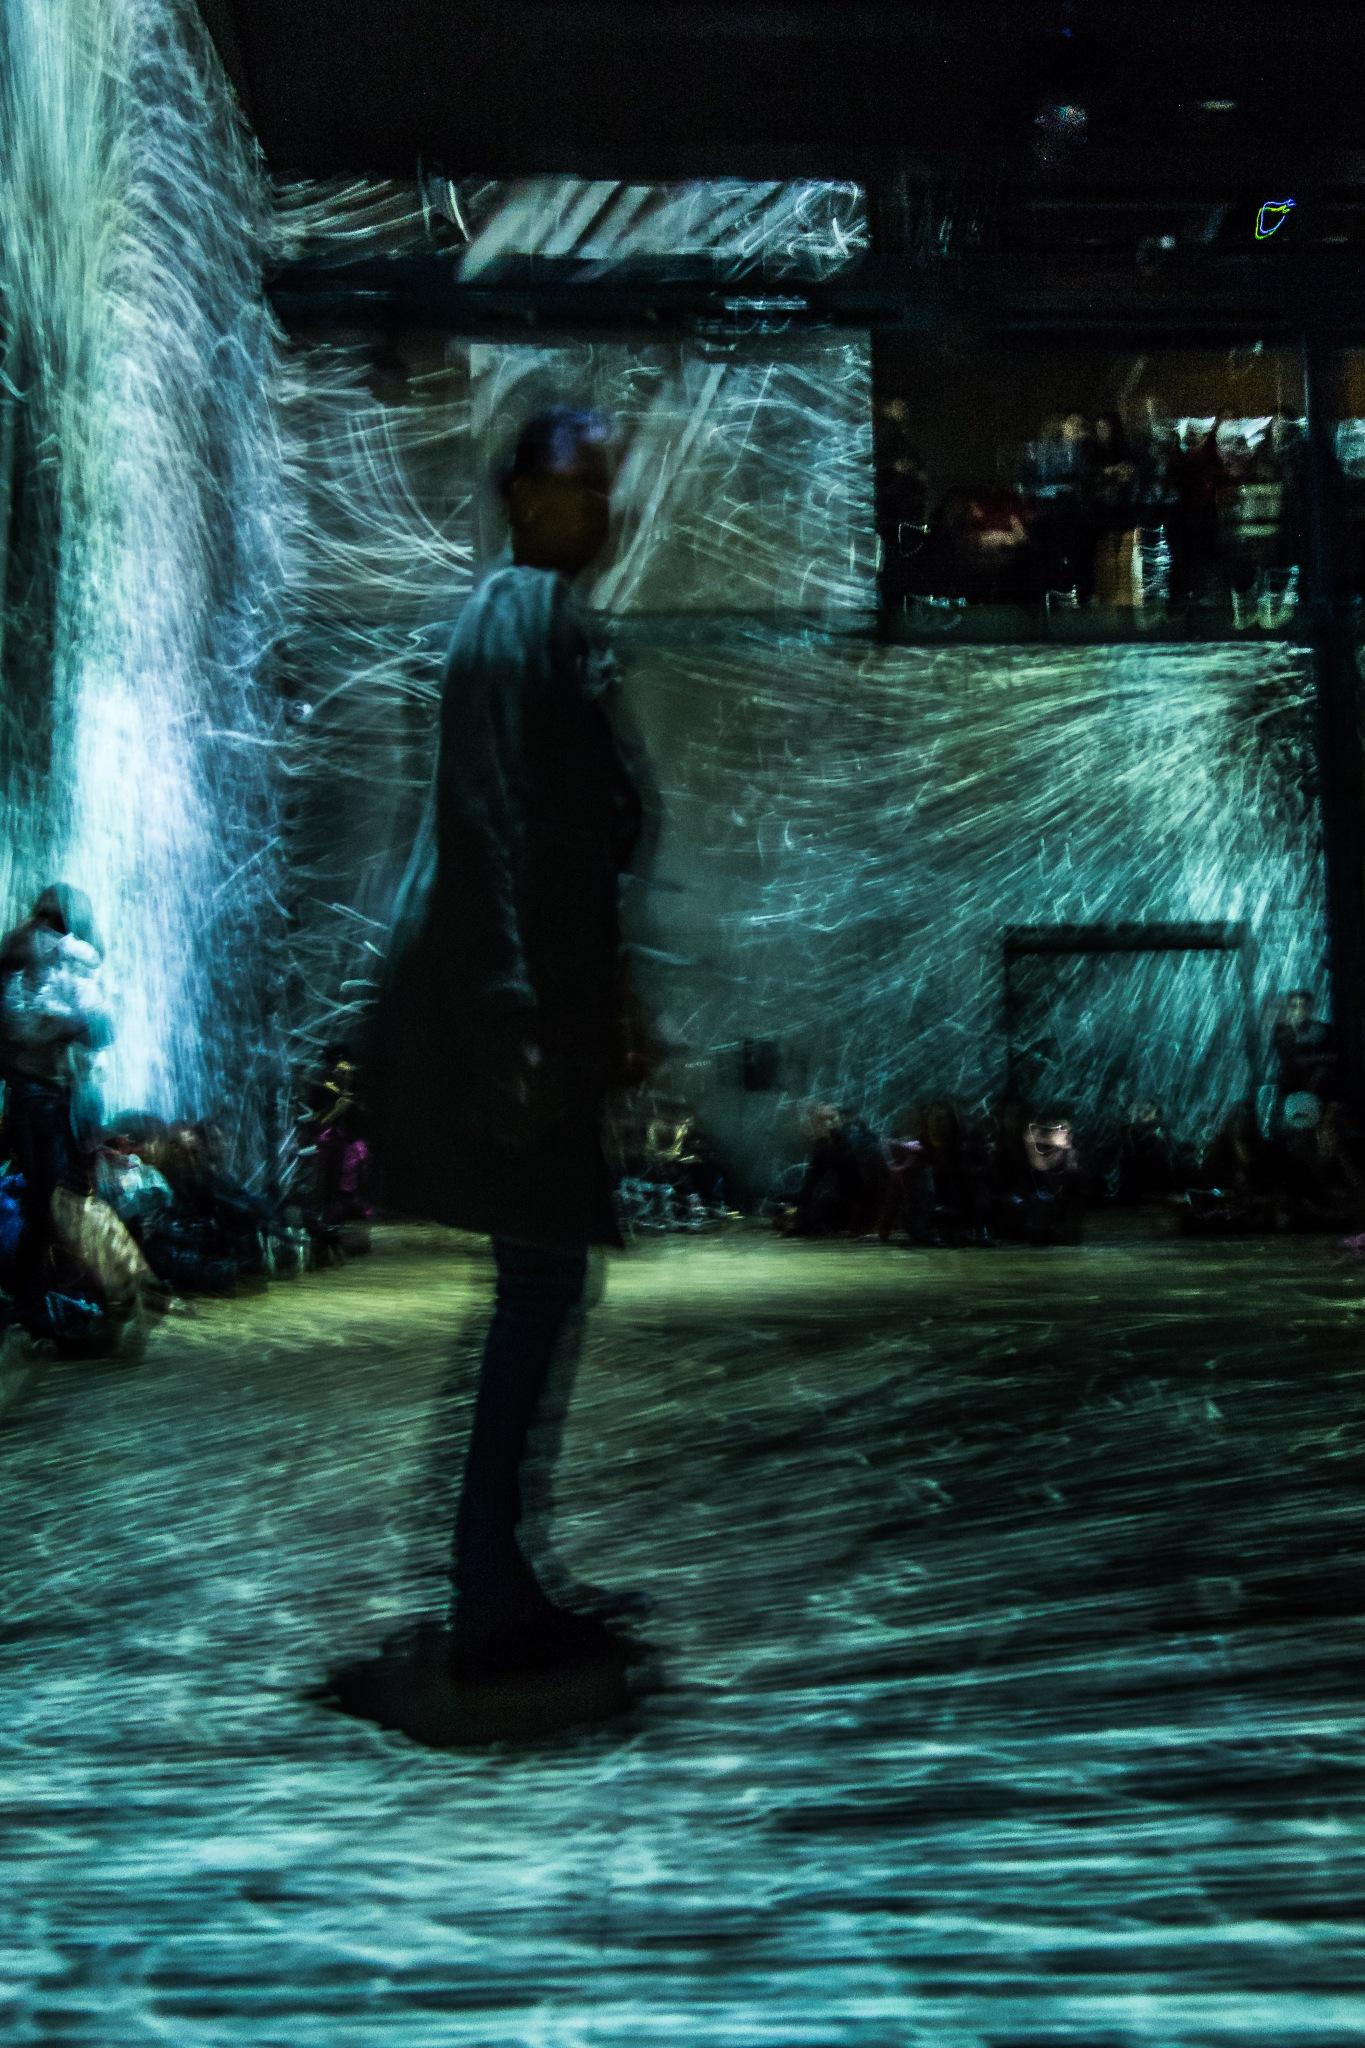 Electronic flow by Hervé Samson